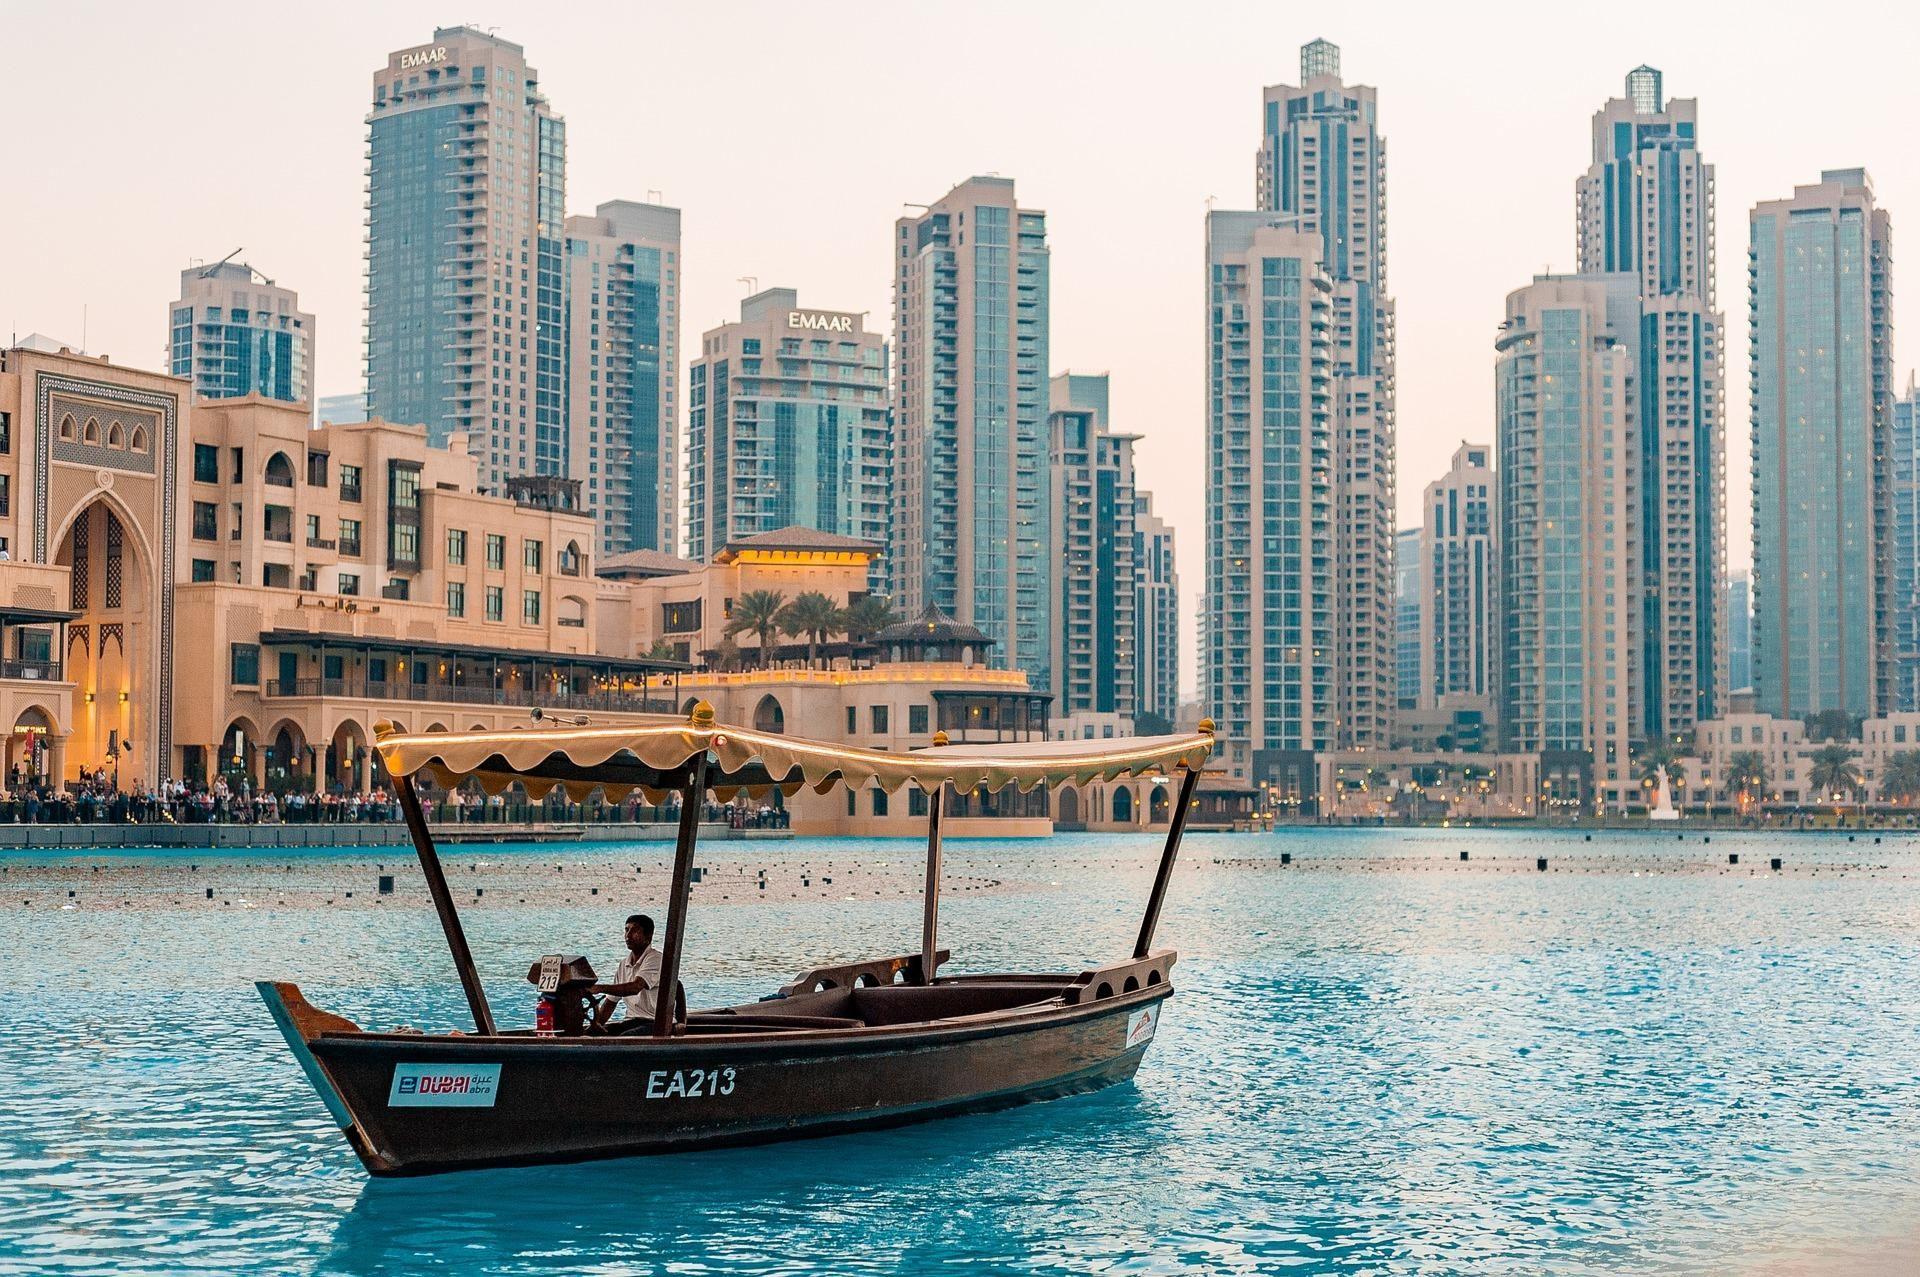 Dubai's Bayut, Dubizzle owners, EMPG, OLX to merge, forming $1 bln unicorn start up